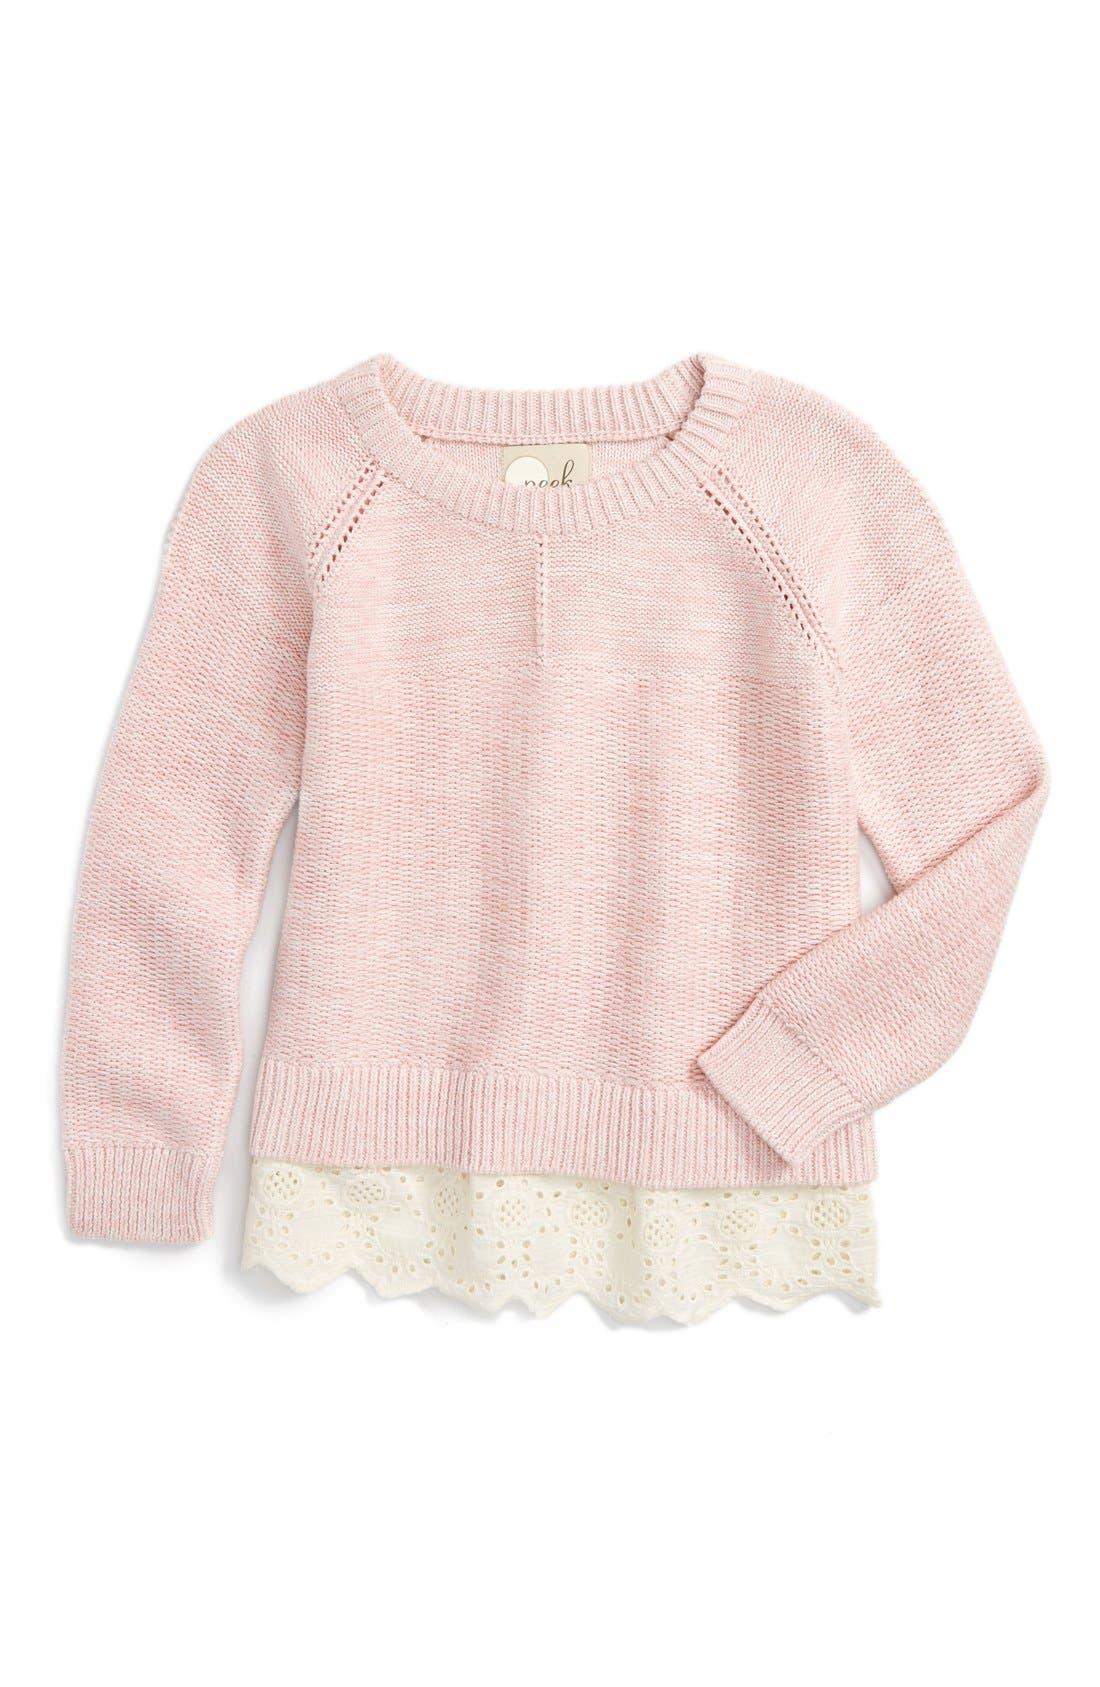 Main Image - Peek Lulu Sweater (Toddler Girls, Little Girls & Big Girls)